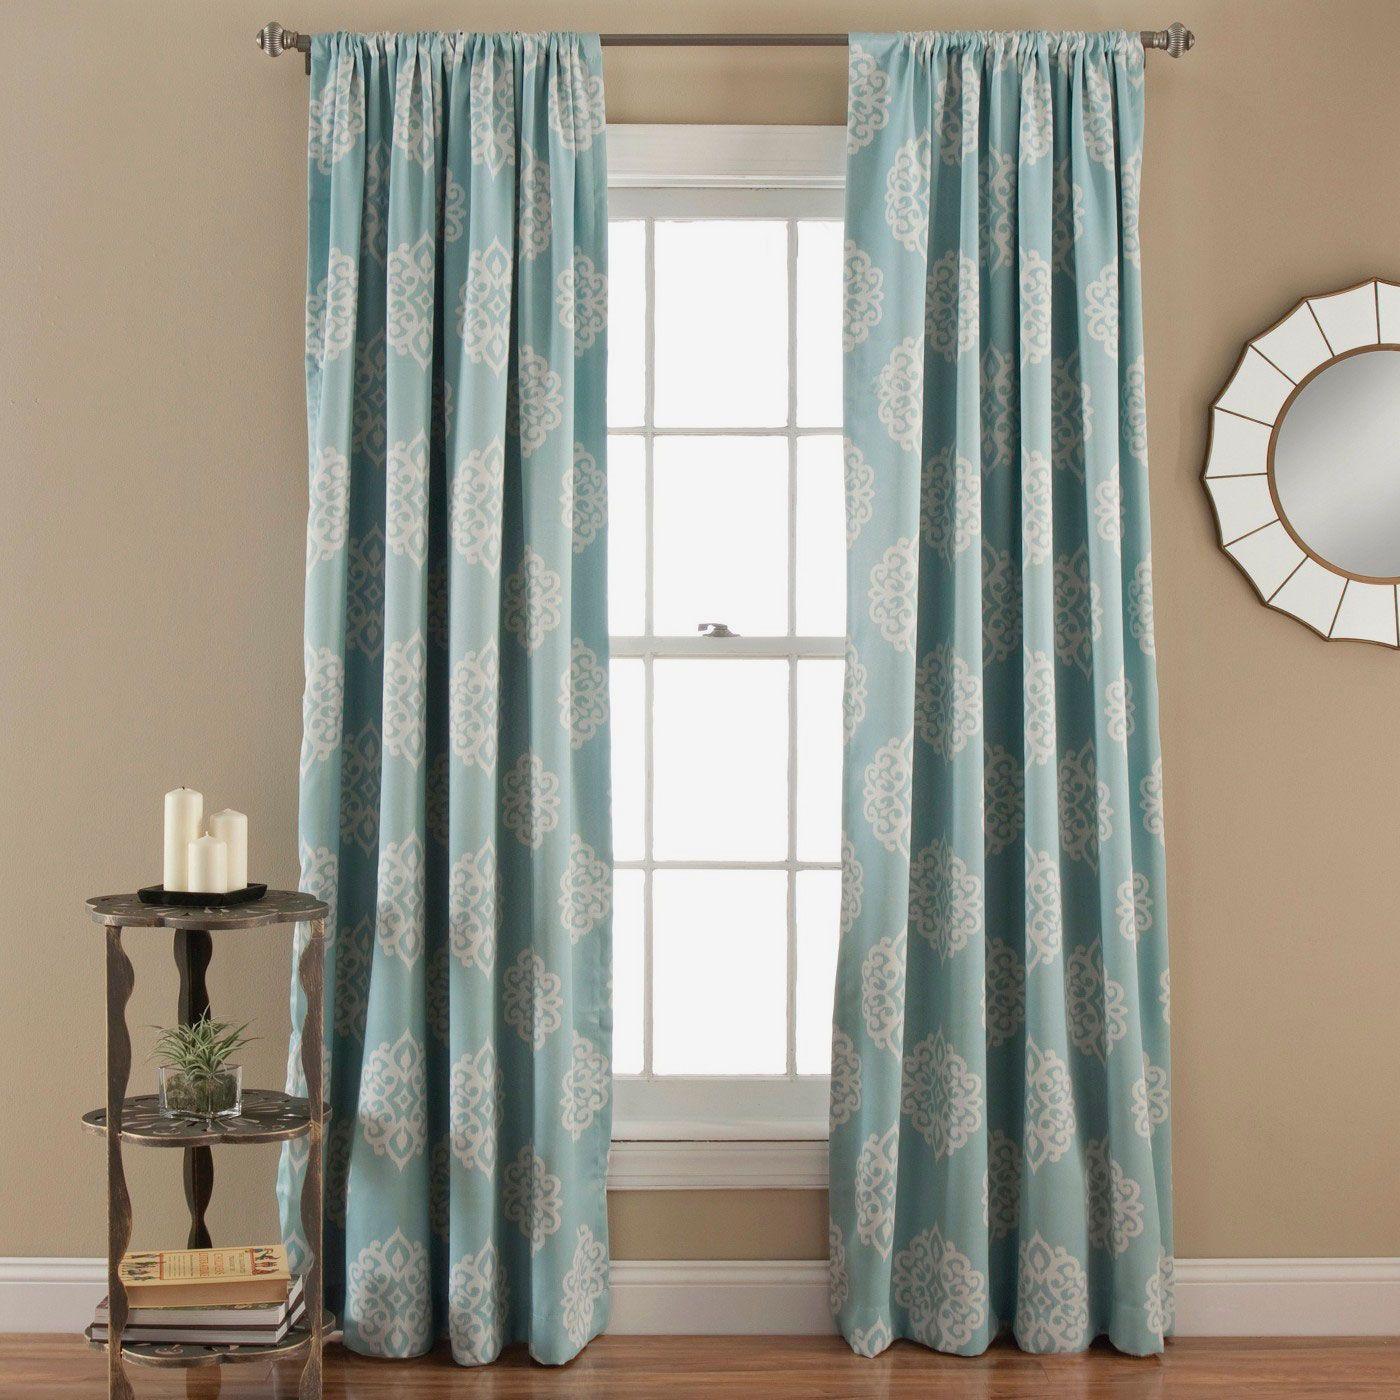 Sophie Room Darkening Curtain Panels